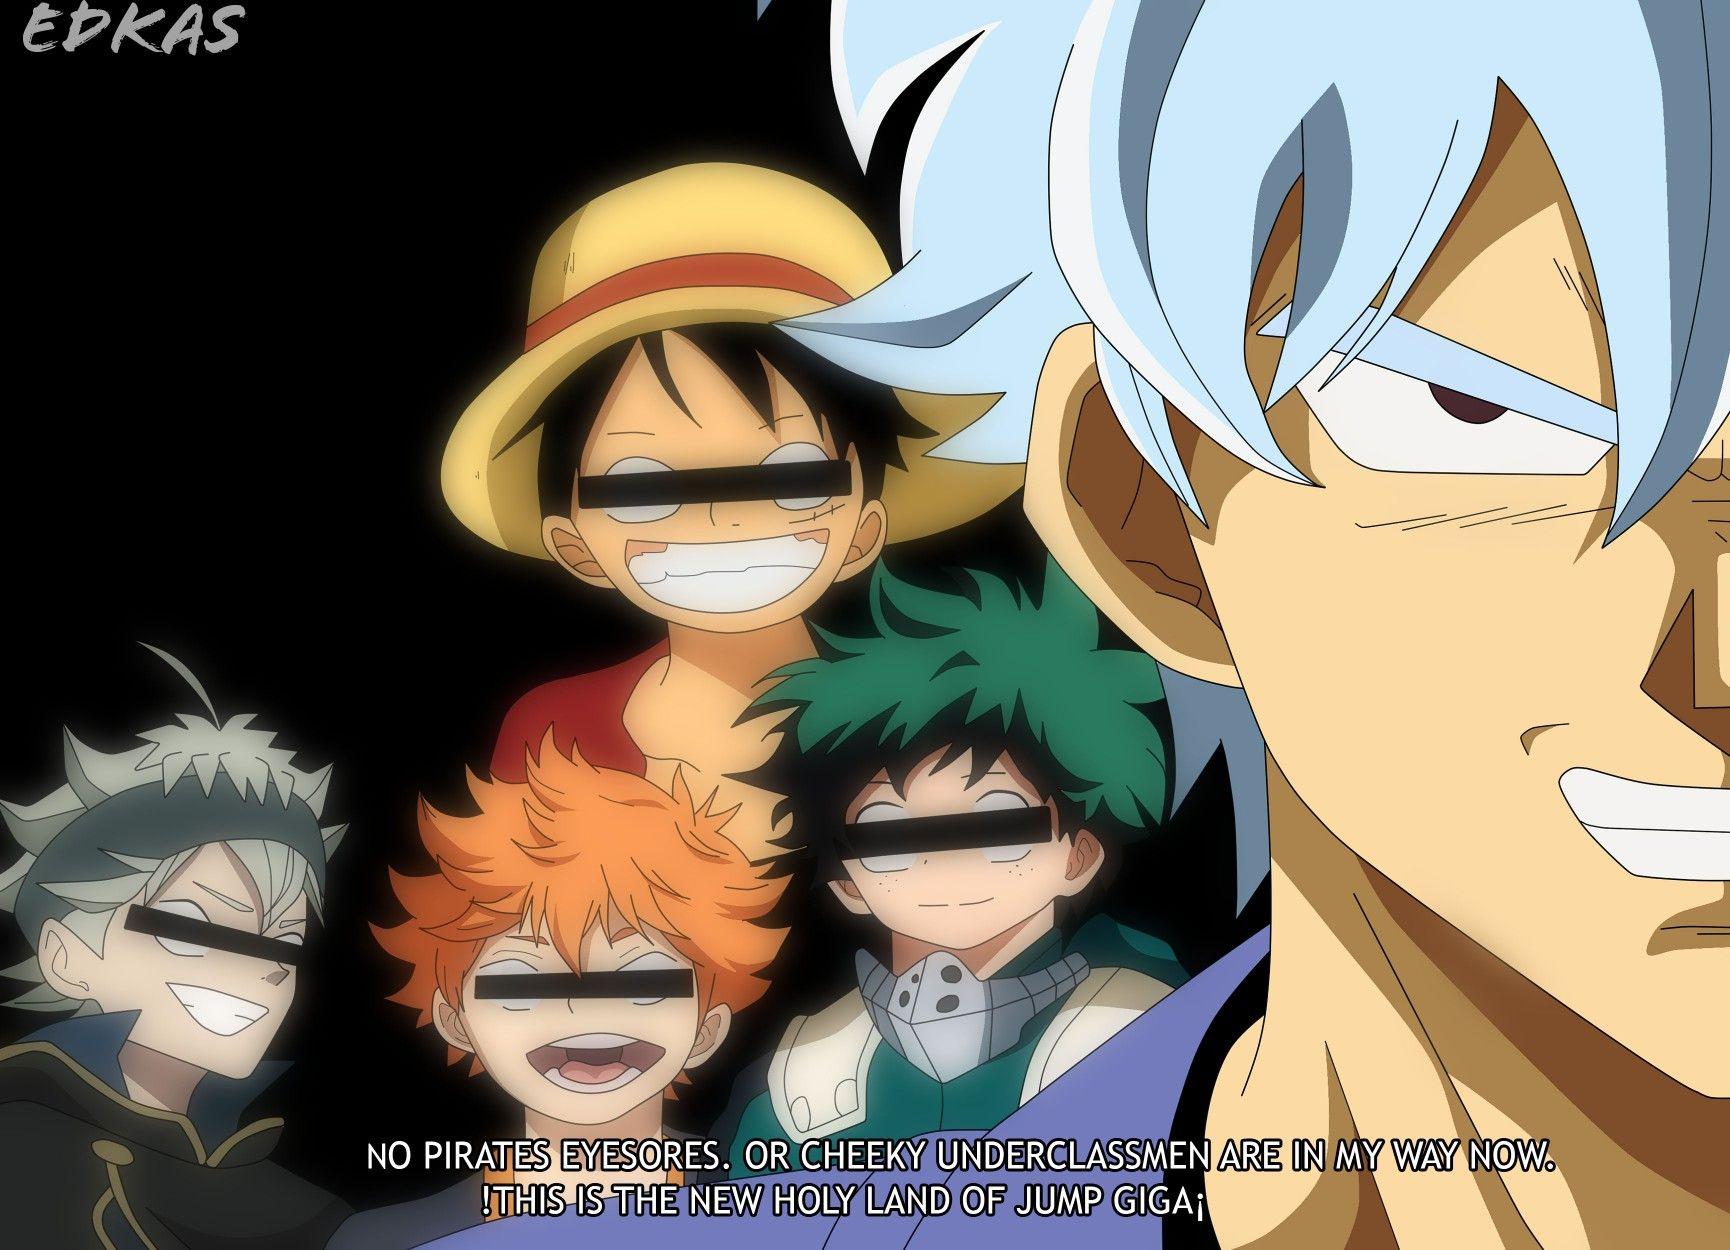 Pin de Shonen Jump Heroes em Shonen Jump & crossovers em